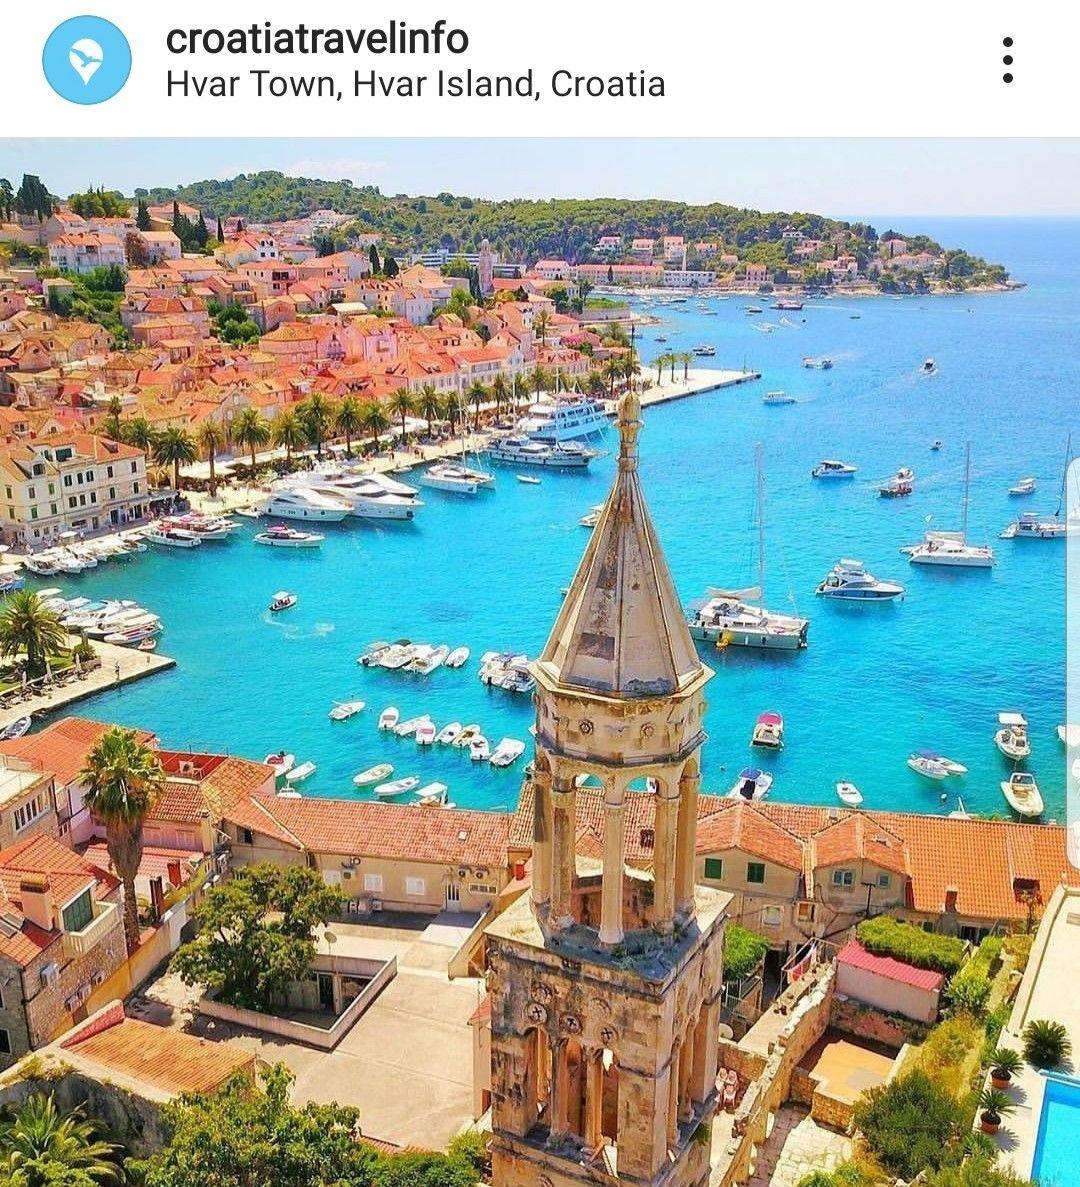 Pin Von Yildirim Zanajana Auf Best Of Croatia Old State Hvar Kroatien Kroatien Urlaub Schone Orte